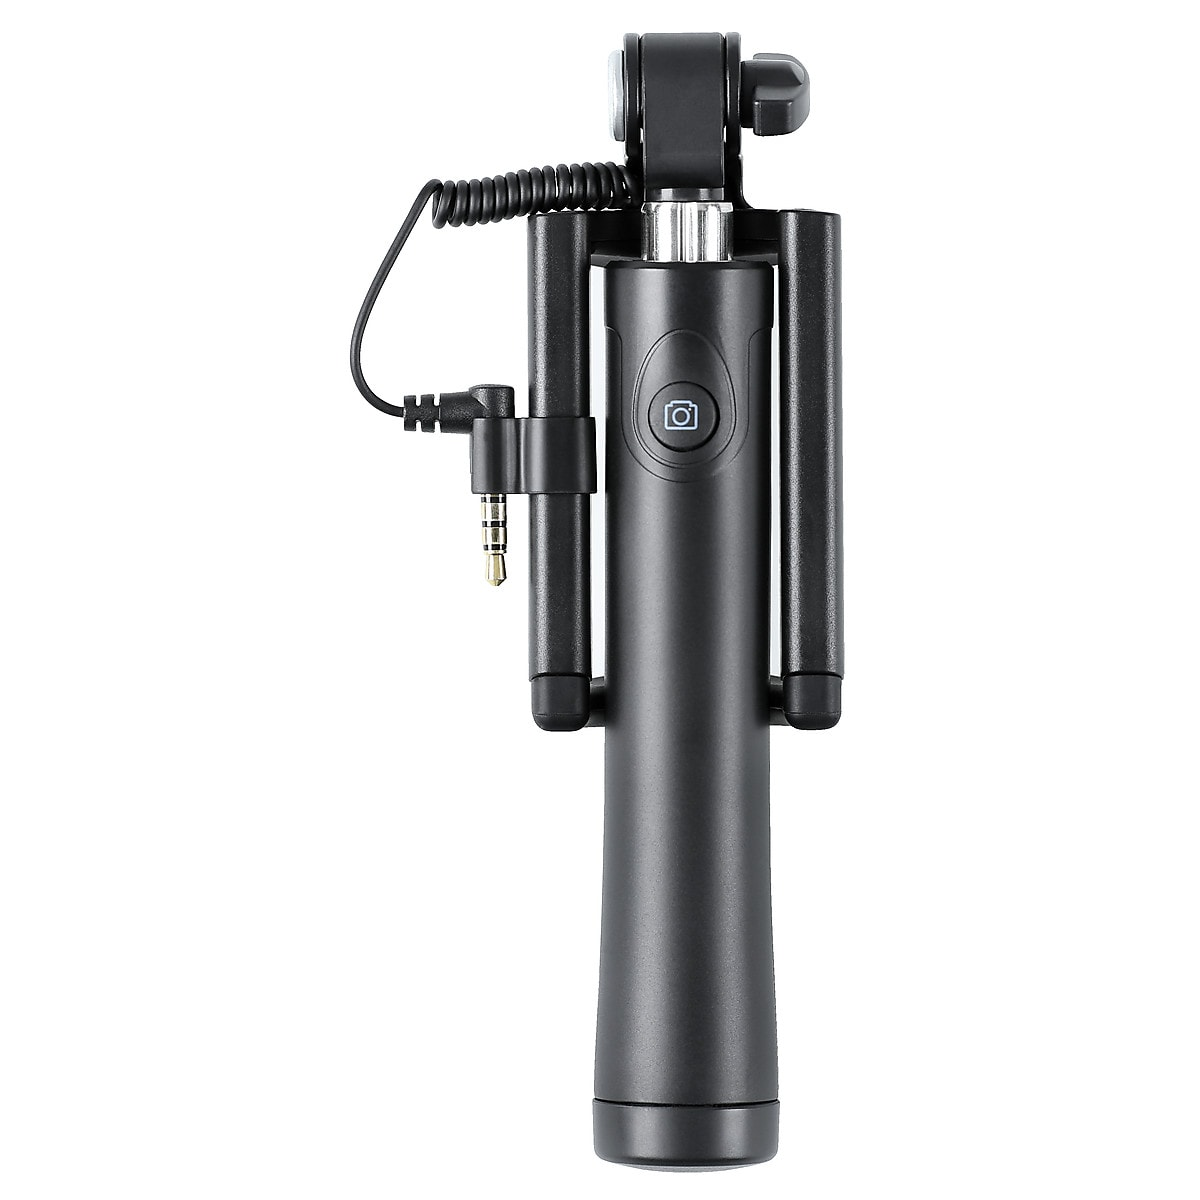 Selfiepinne med 3,5 mm-anslutning, Clas Ohlson